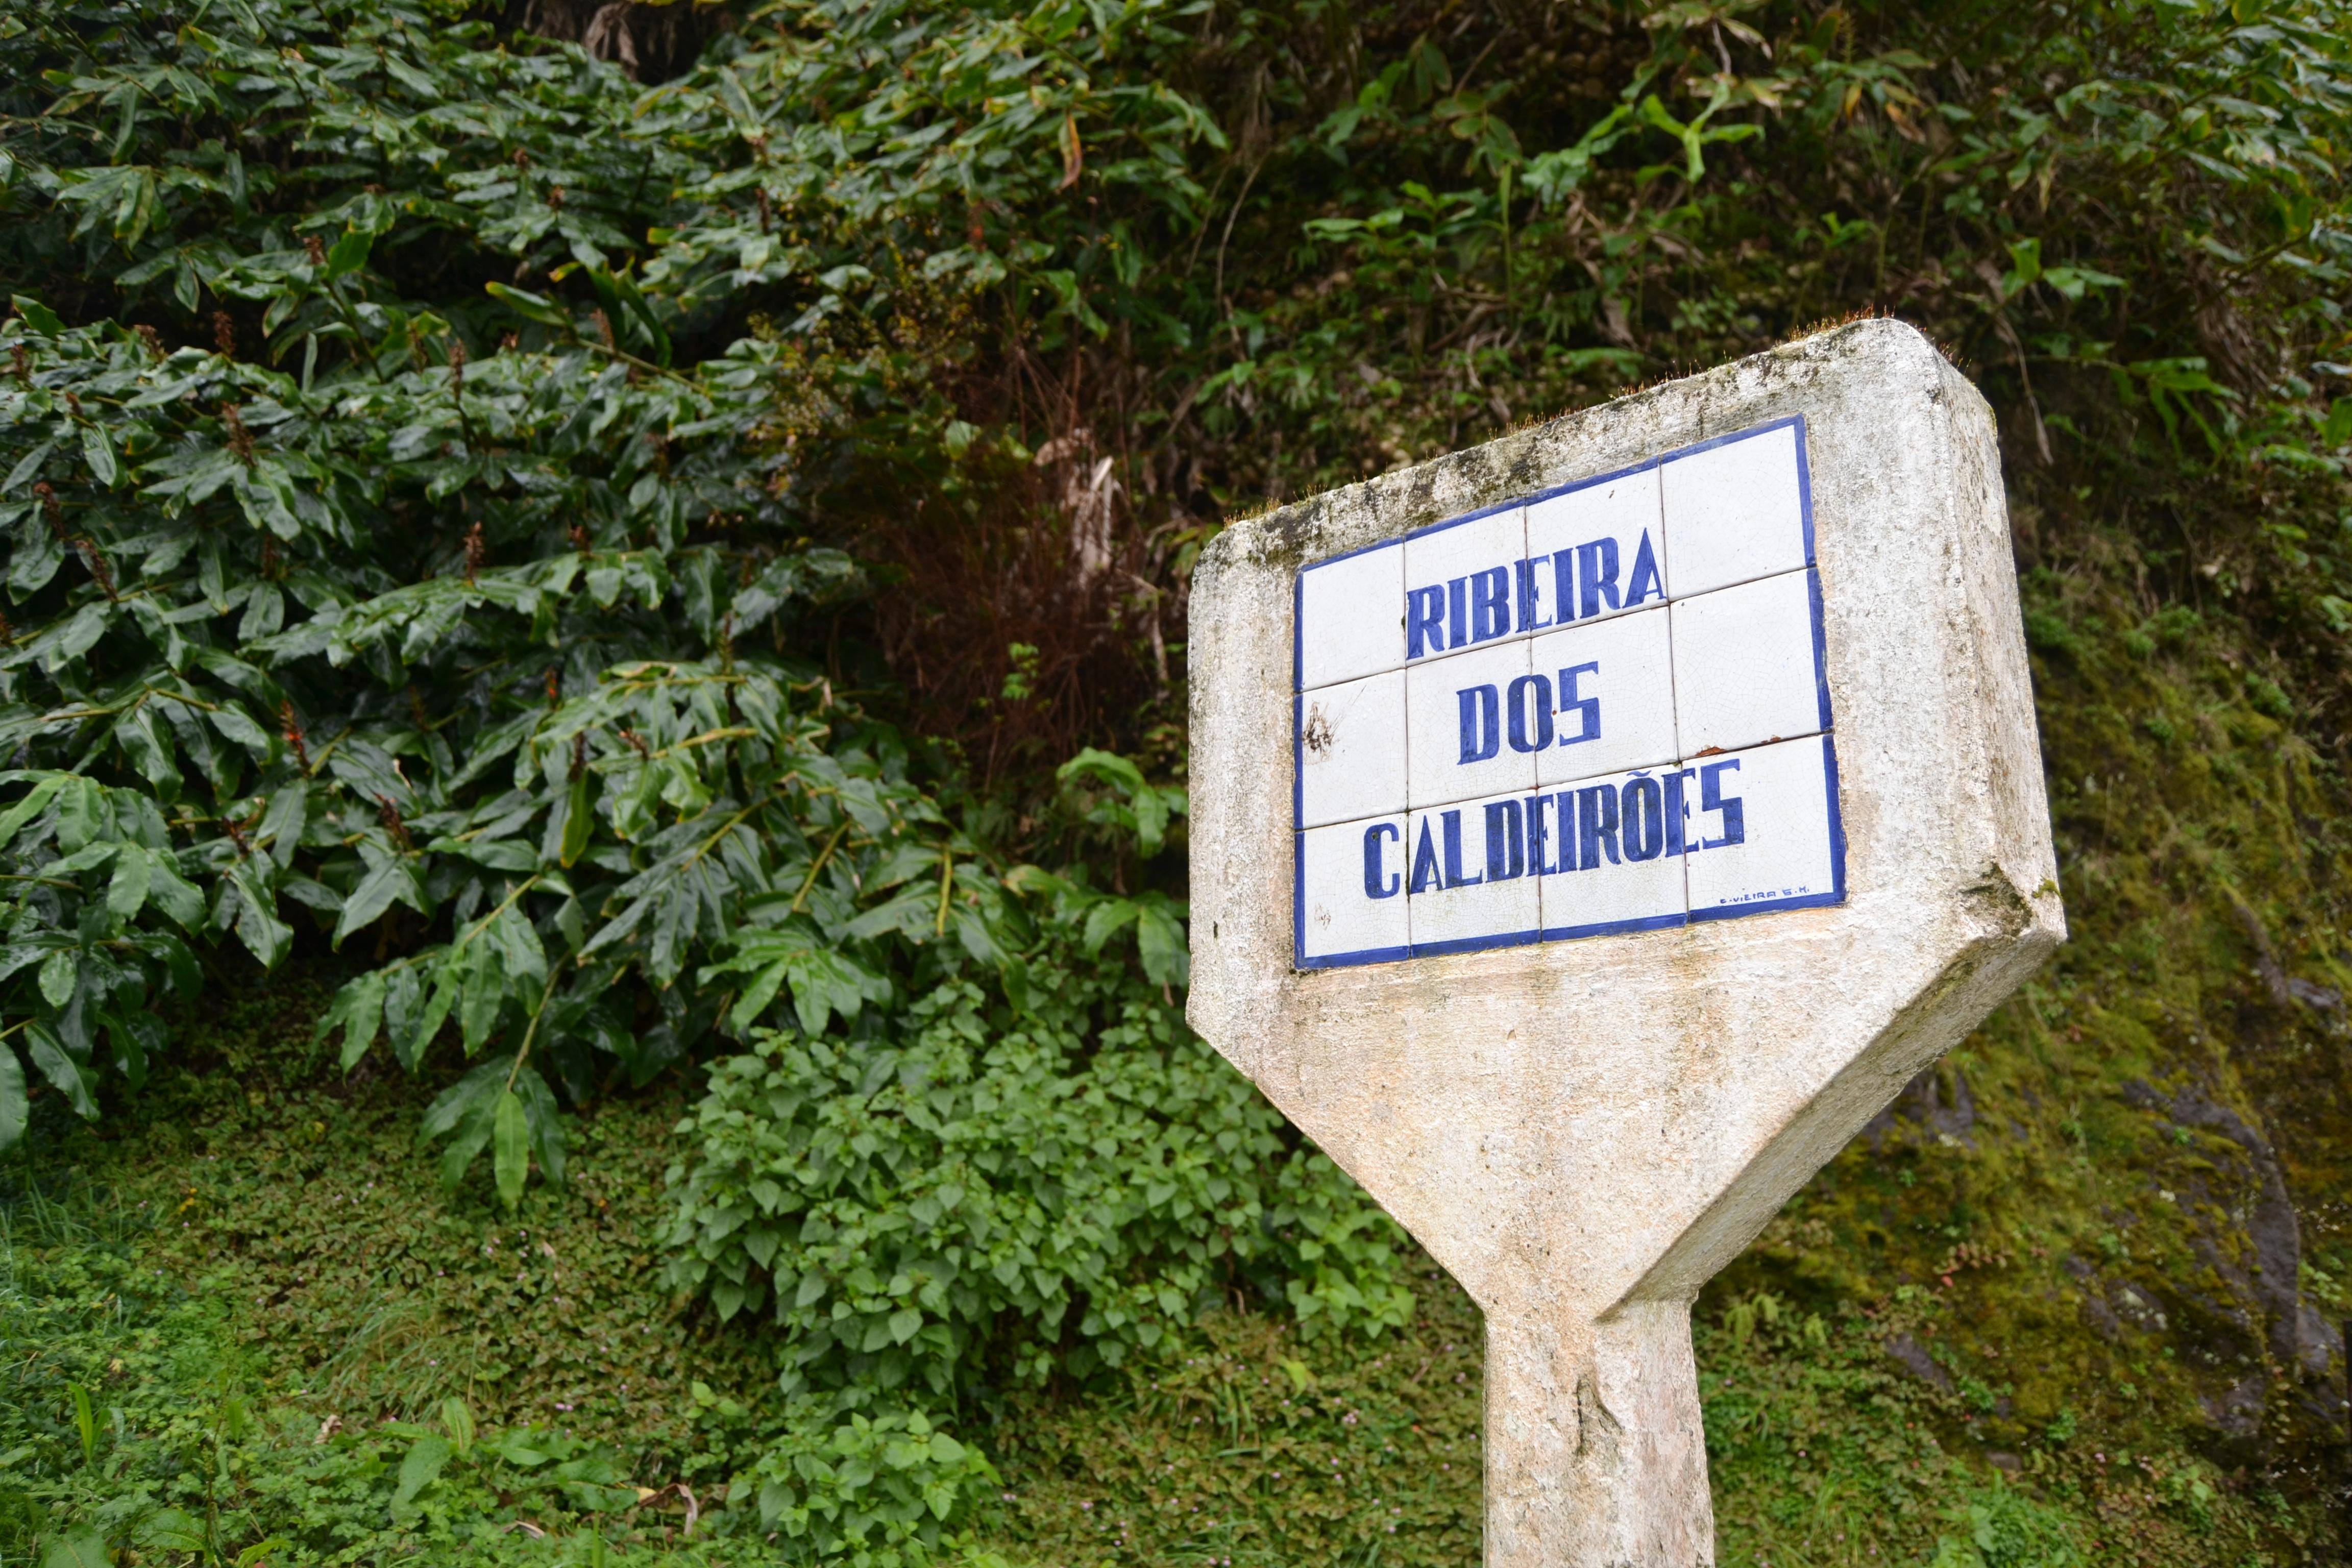 Ribeira dos Calderoes